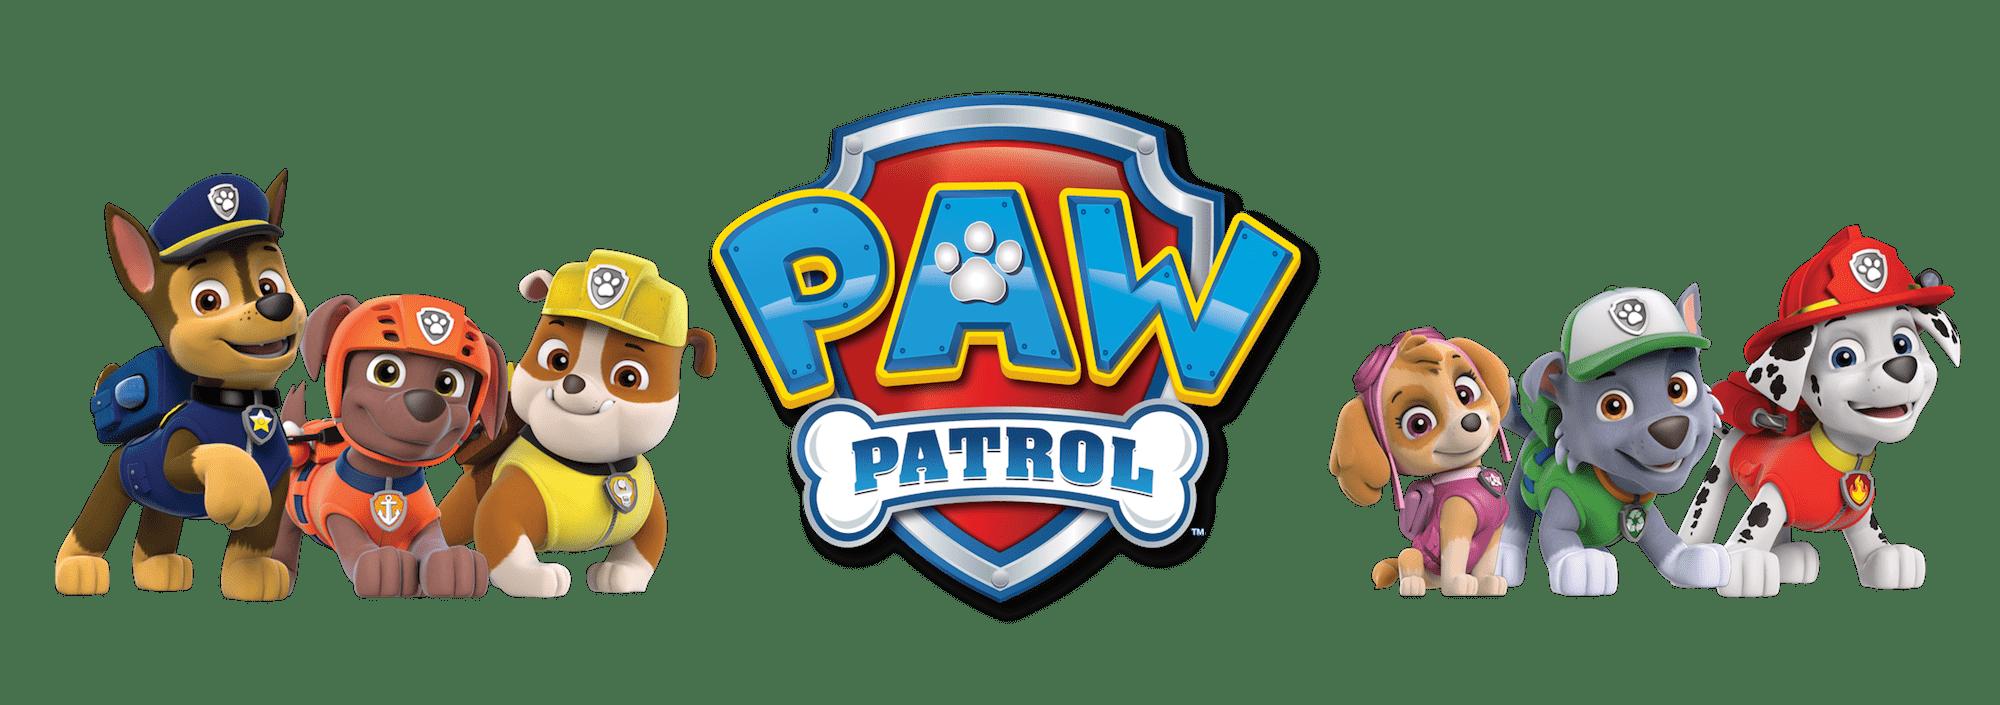 Paw patrol clipart logo clip royalty free stock Pawpatrol Logo Dogs Clipart Paw Patrol Clipart Png clip royalty free stock